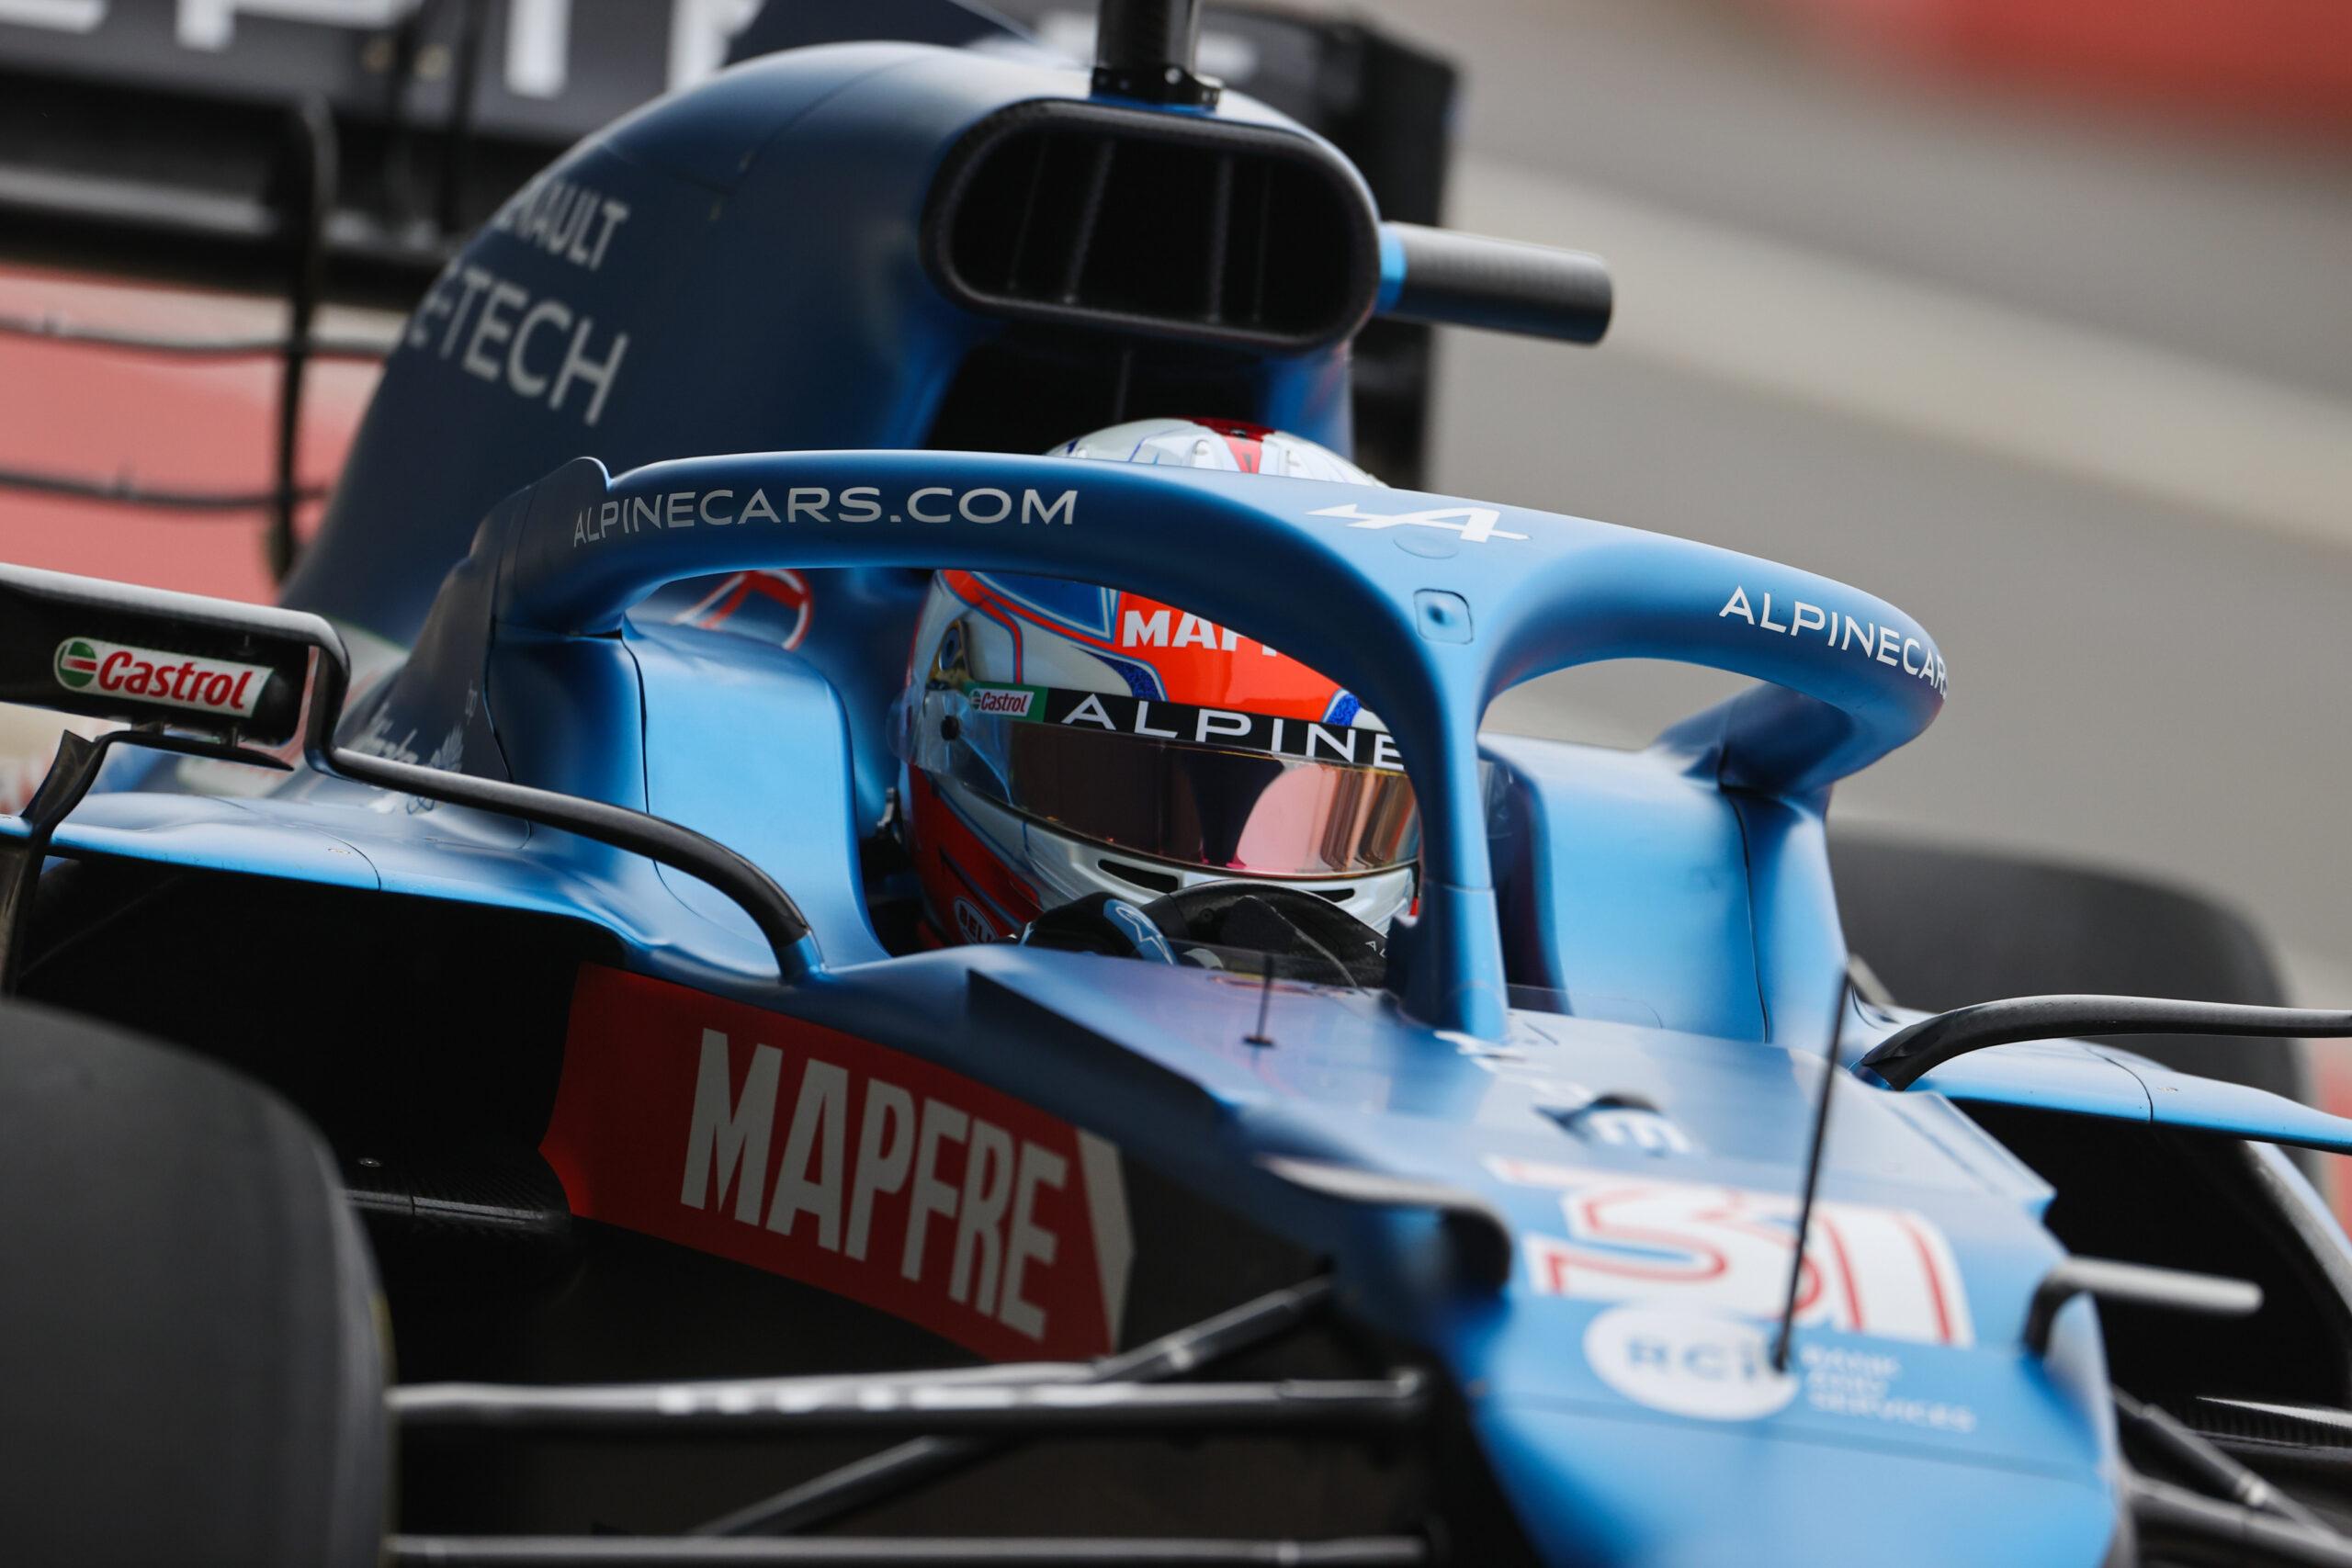 F1 - Vidéo : l'Alpine A521 en piste avec Esteban Ocon